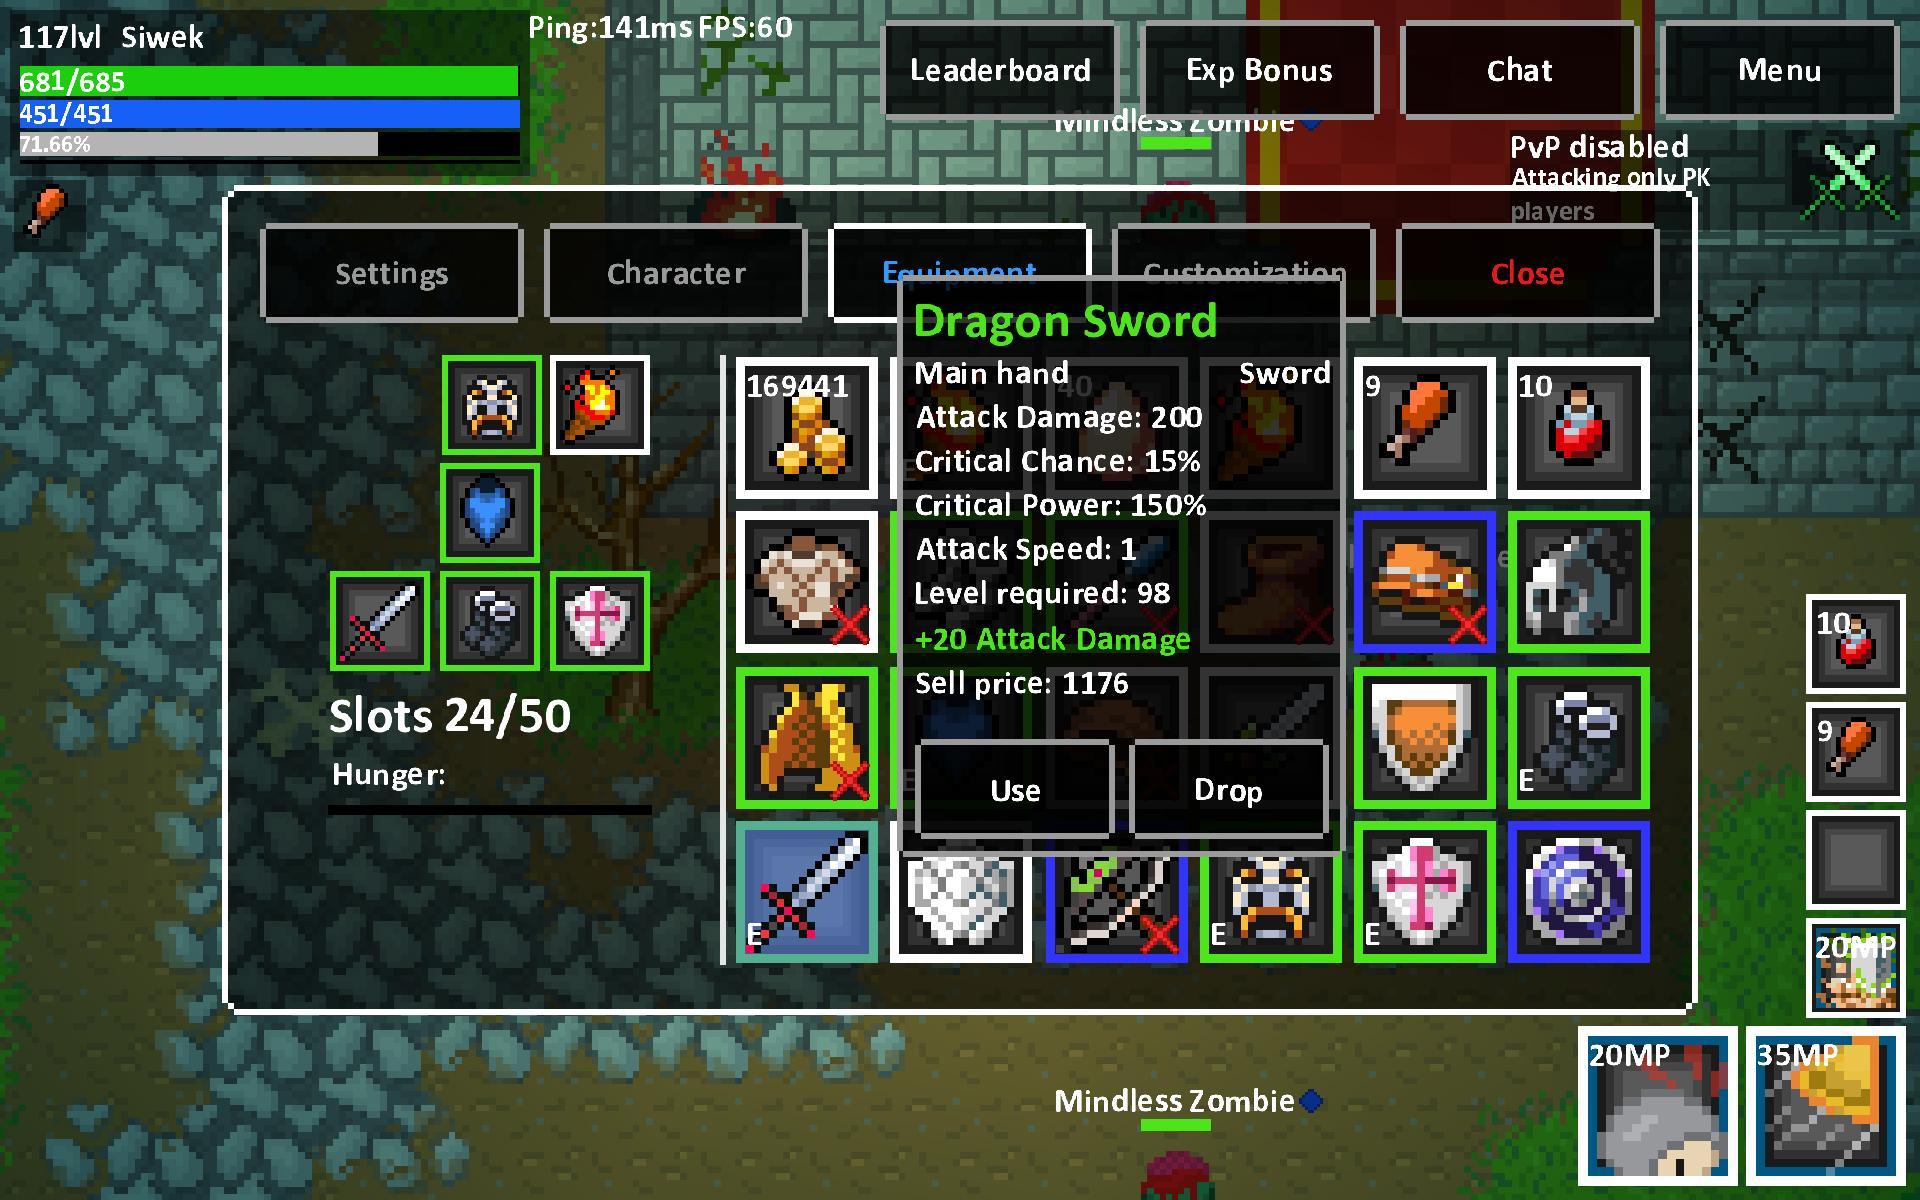 Heroes & Rats MMORPG Online 0.32.2 Screenshot 2